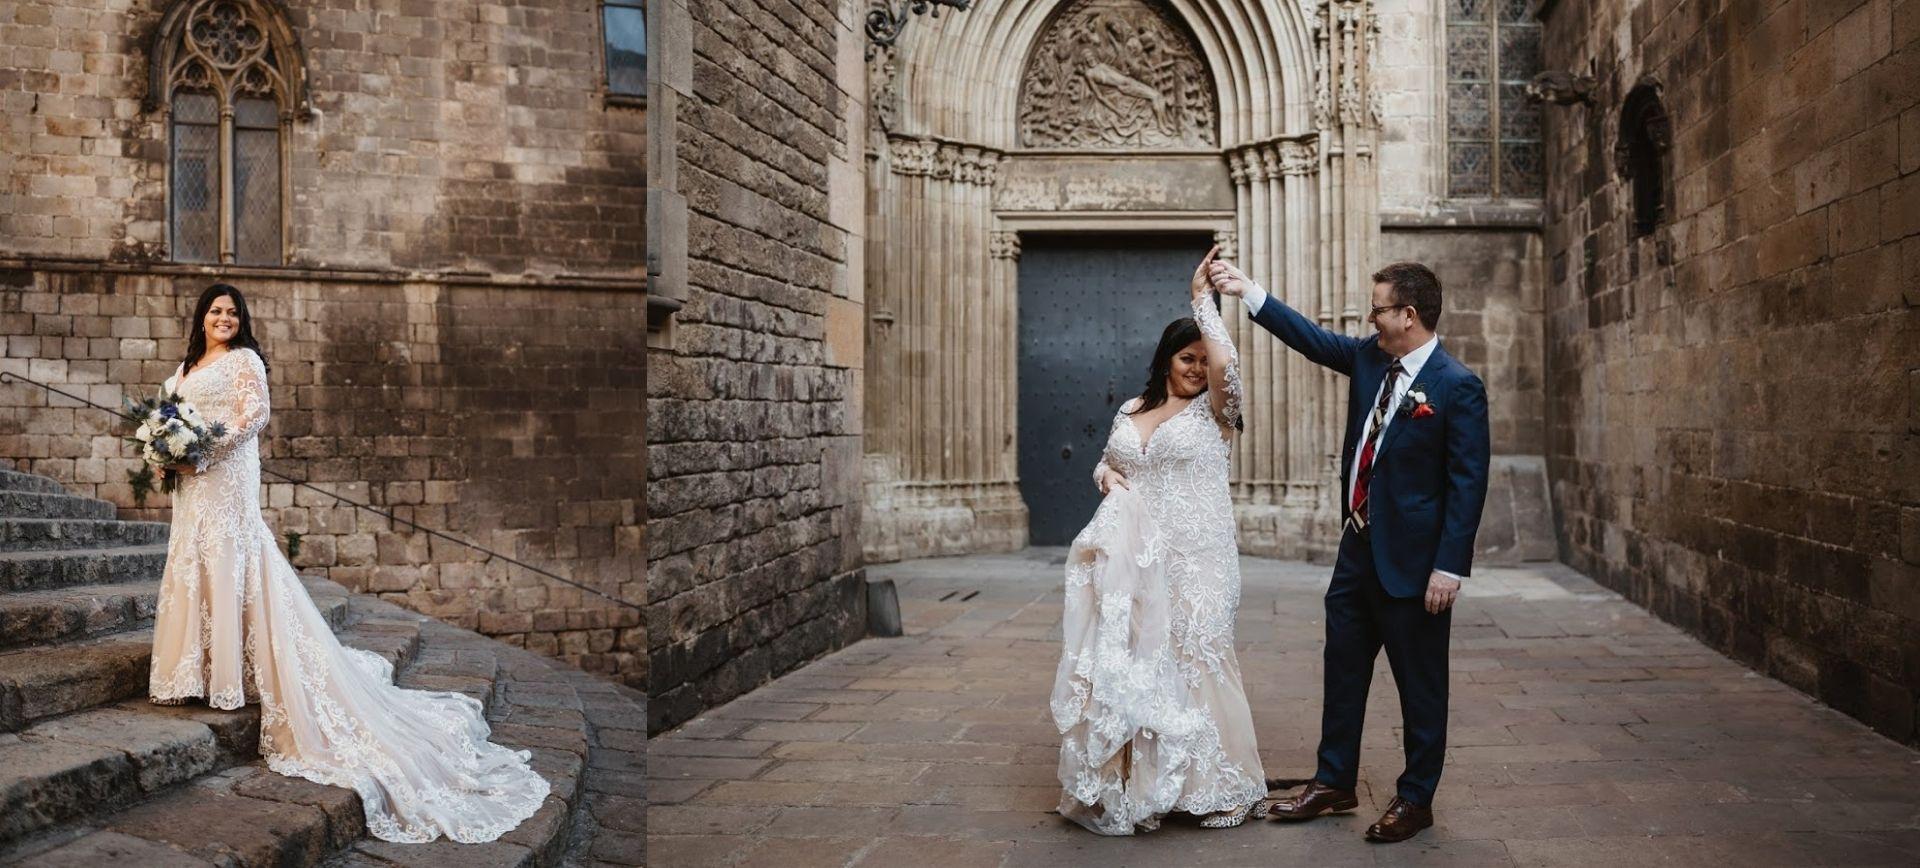 elopement wedding in barcelona - gothic quarter wedding portraits